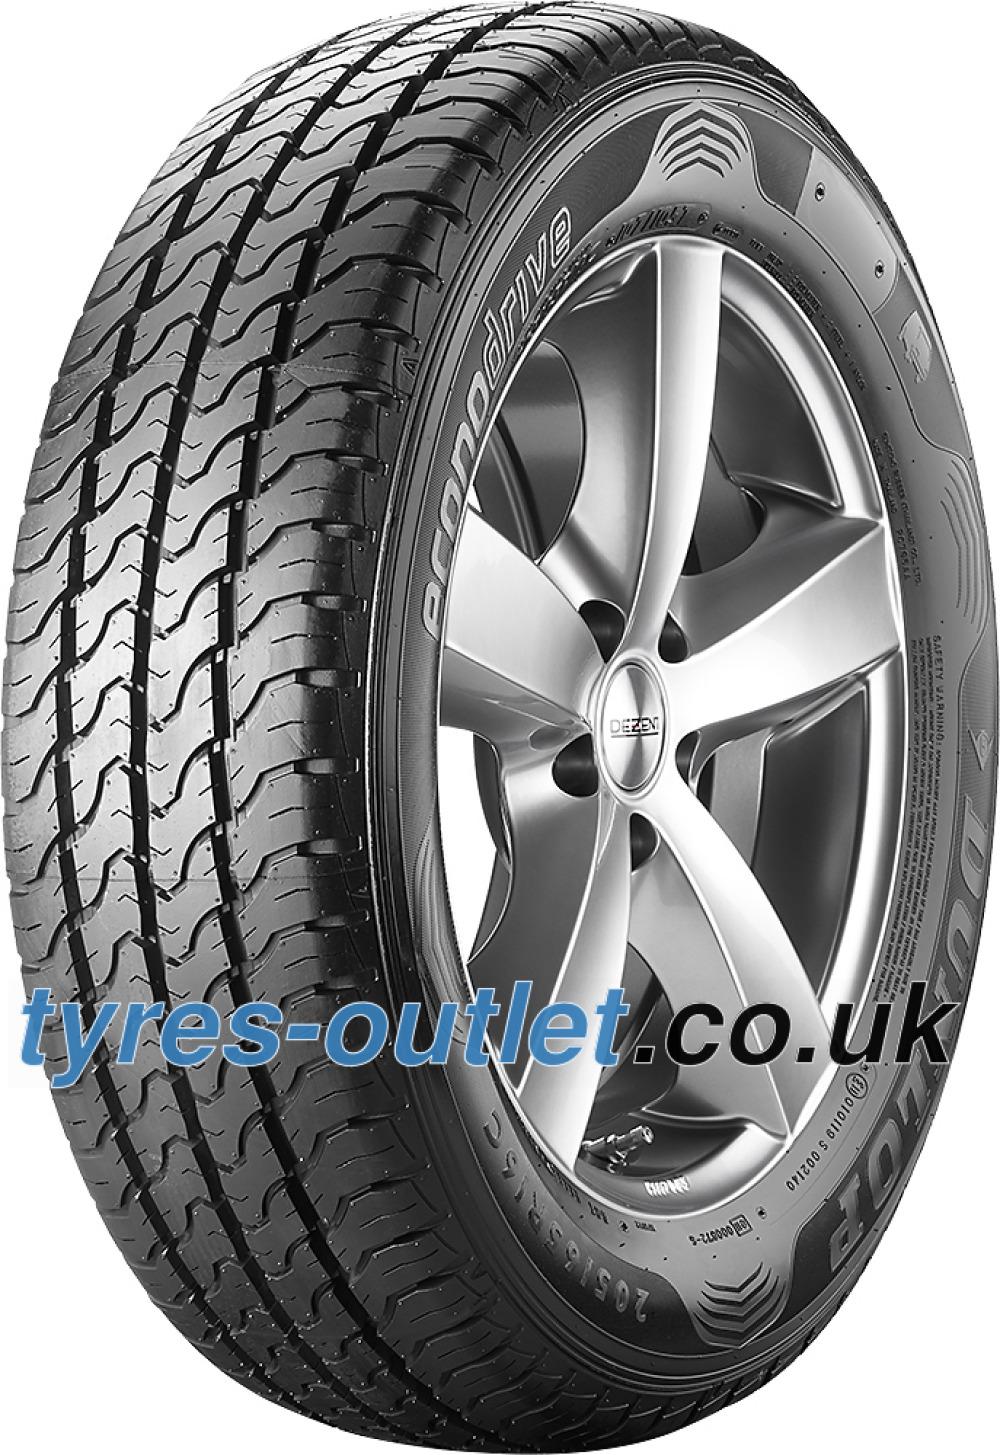 Dunlop Econodrive ( 235/65 R16C 115/113R )